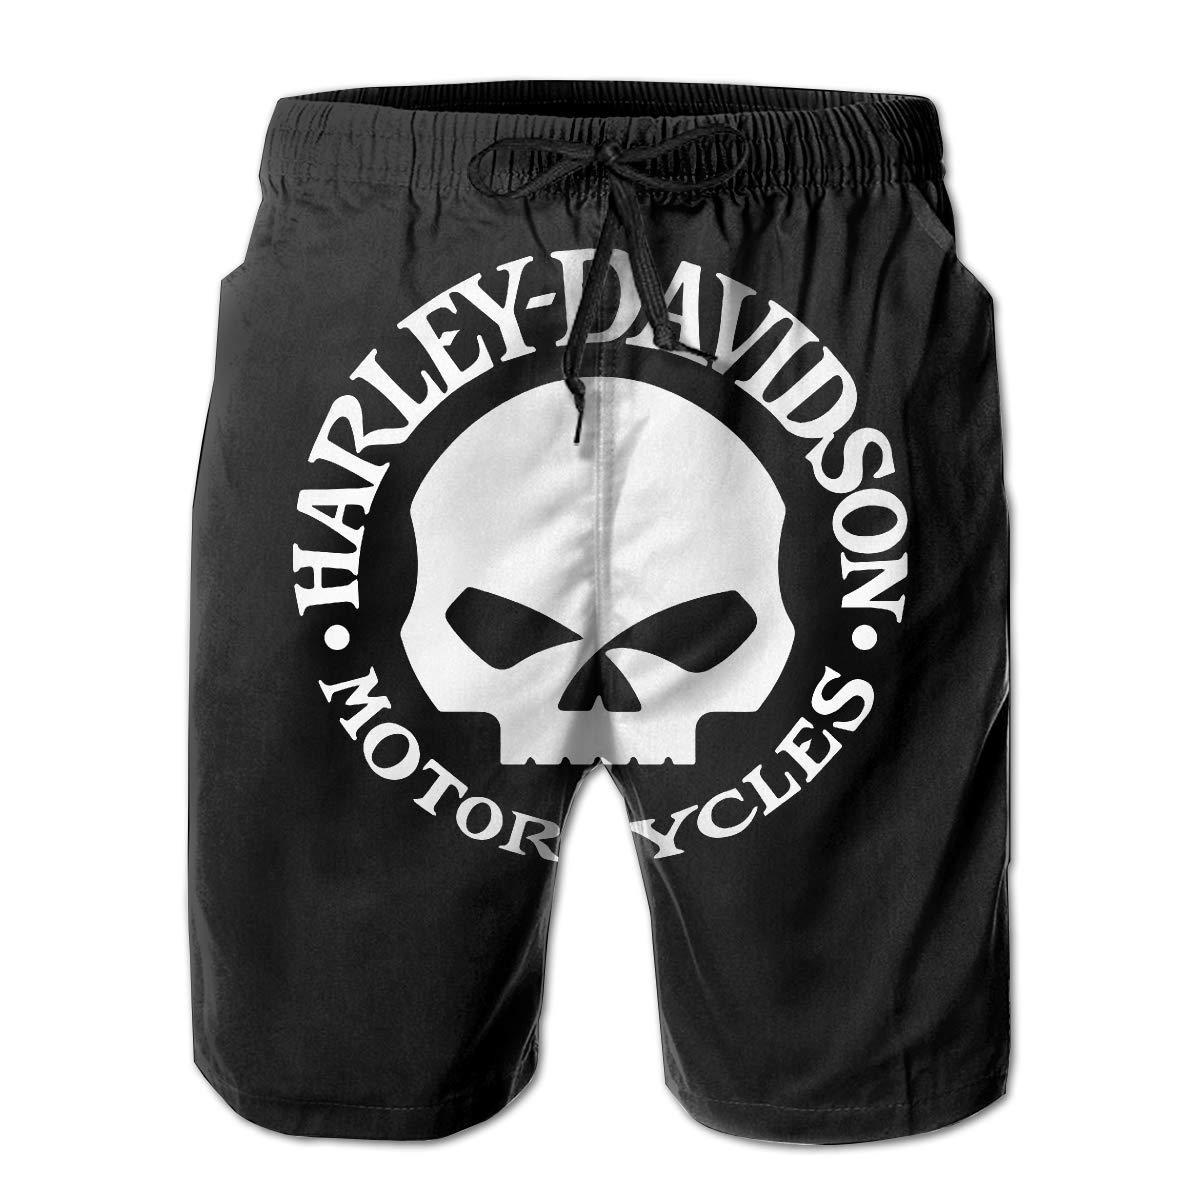 American Flag Skull Military Man Summer Casual Shorts,Beach Shorts Swim Trunks